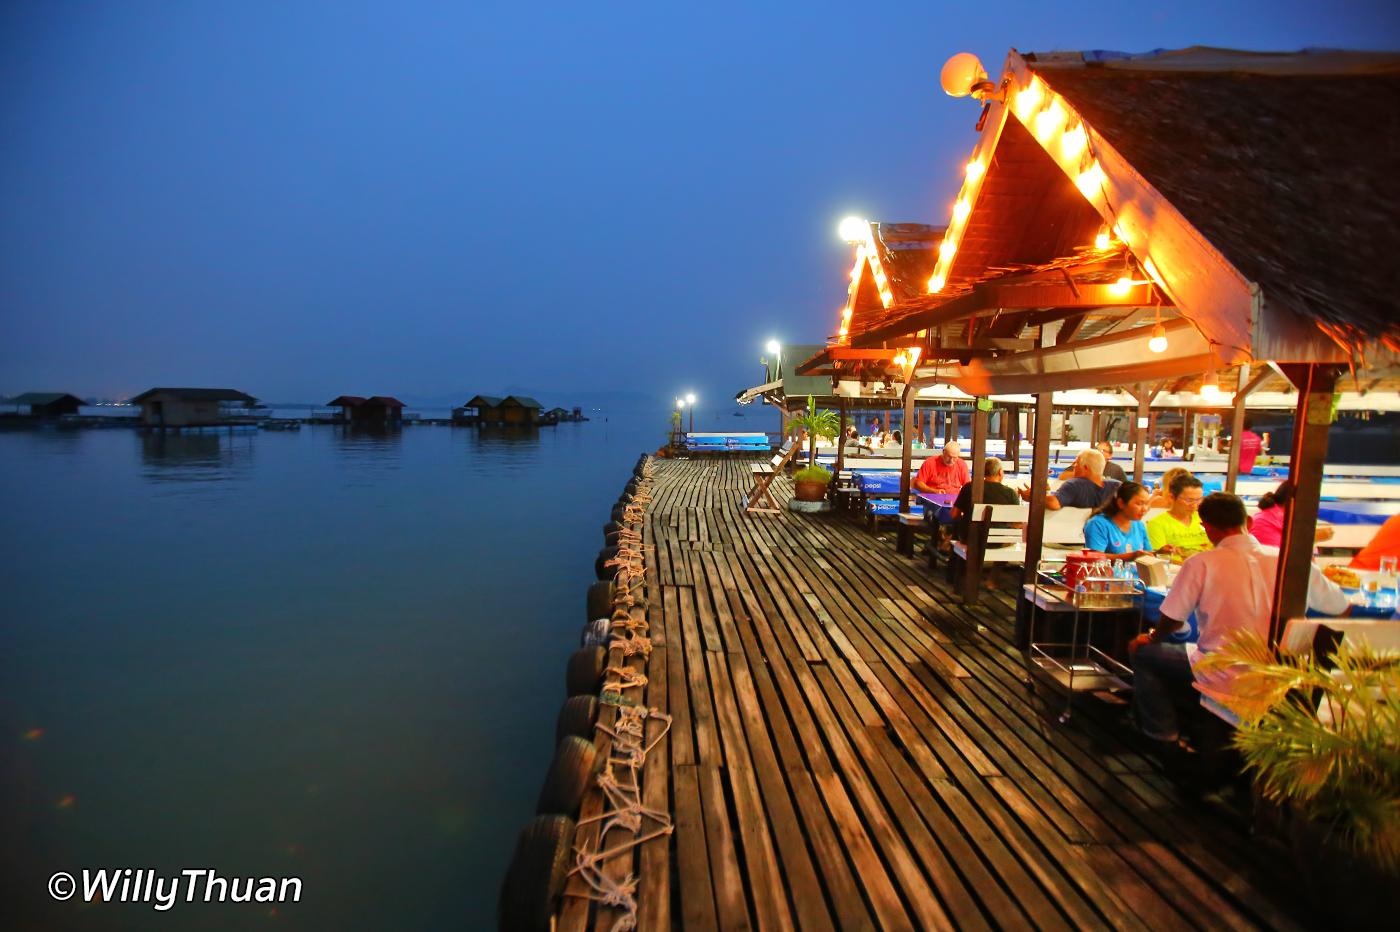 Phuket Floating Restaurant – Kru Suwit Seafood